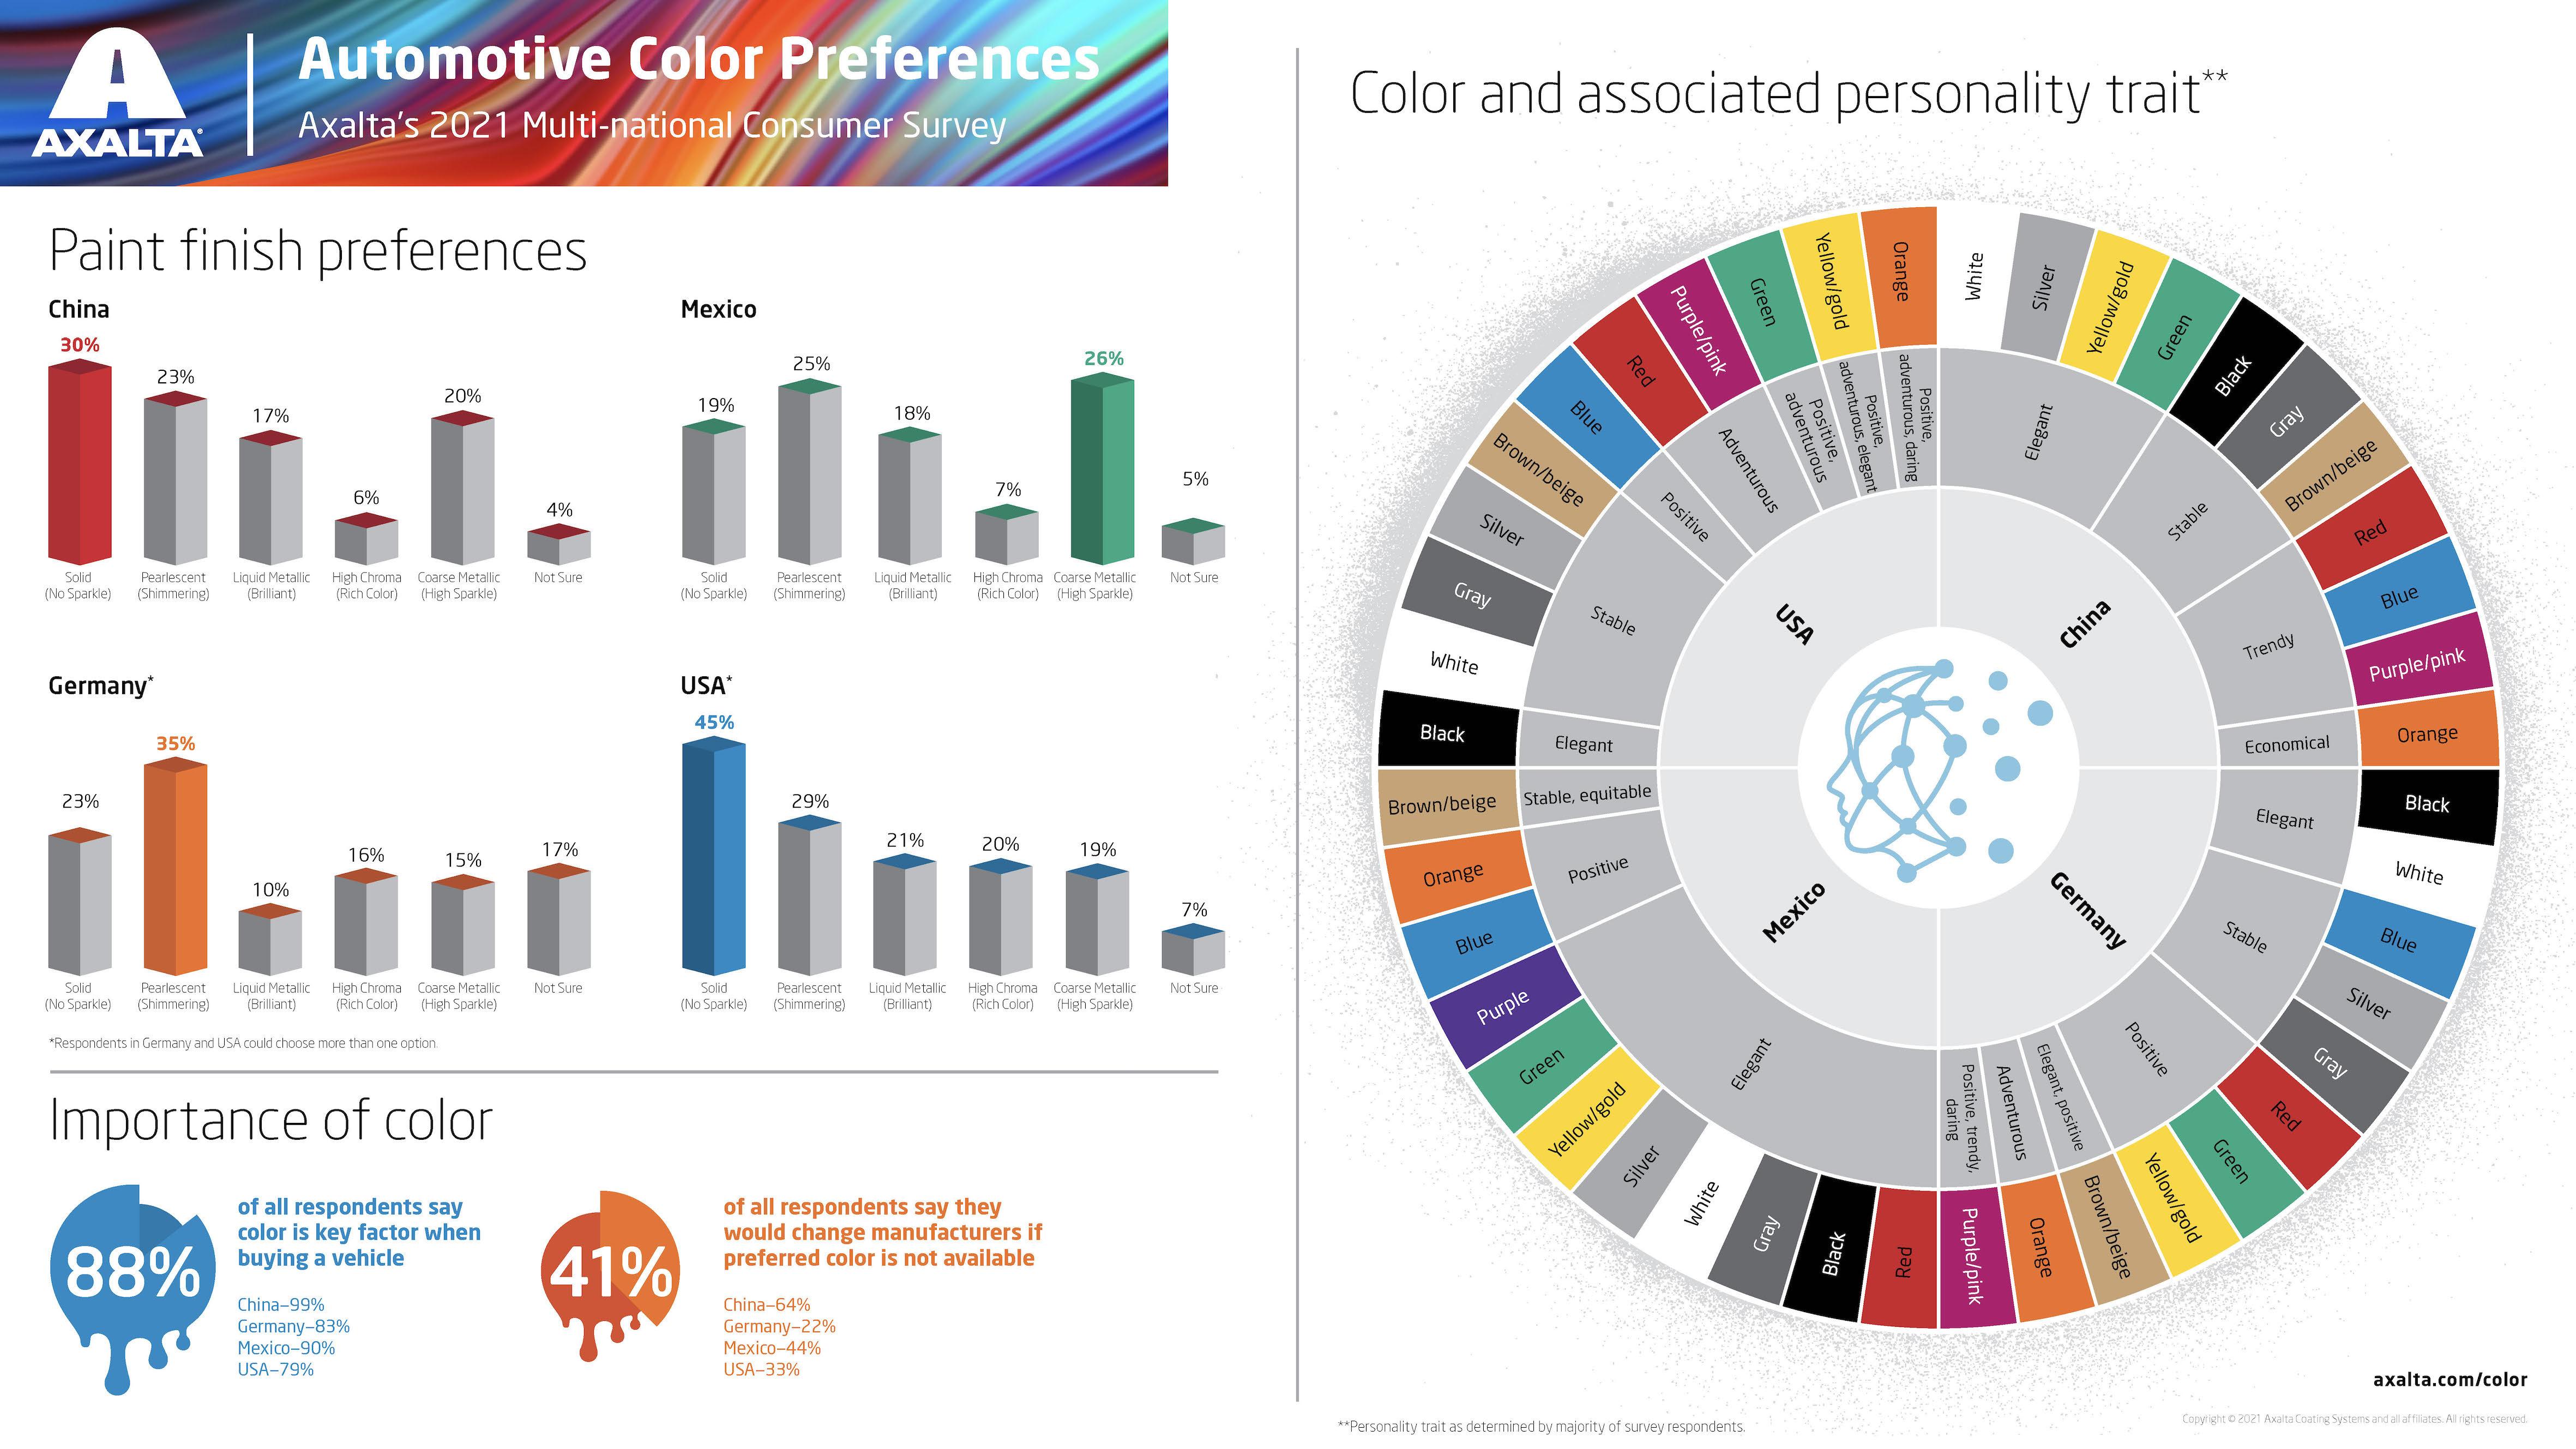 axalta-color-preferences-survey-2021-multi-national-highlights